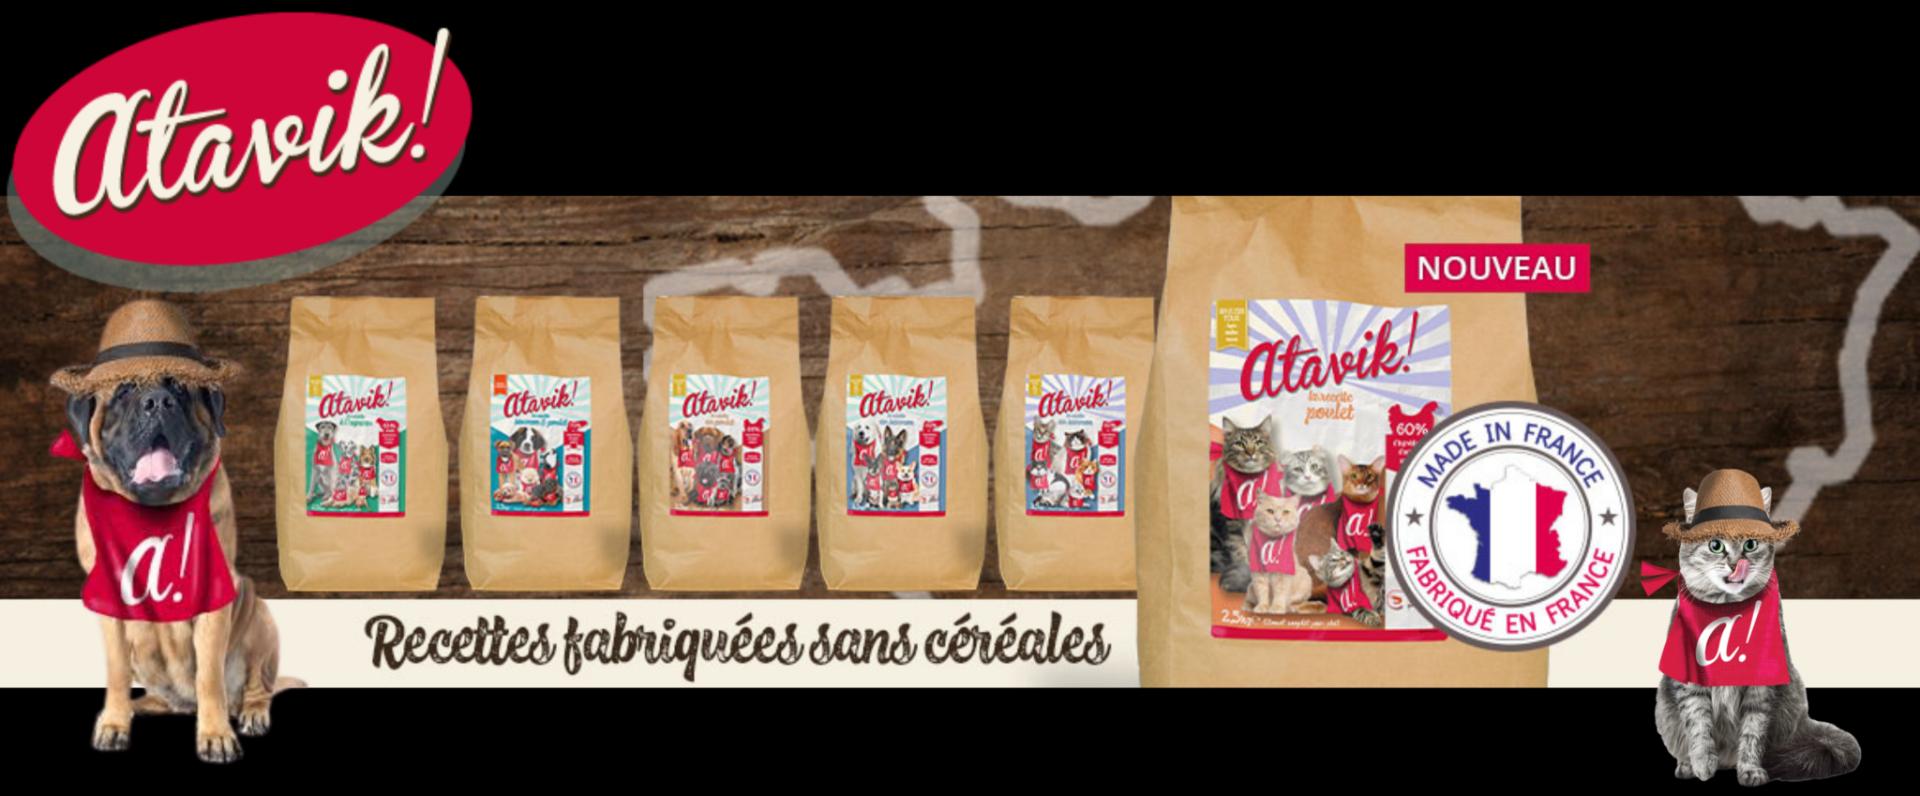 animazoo_atavik-marque-cht-i-sans-cereales-a-decouvrir